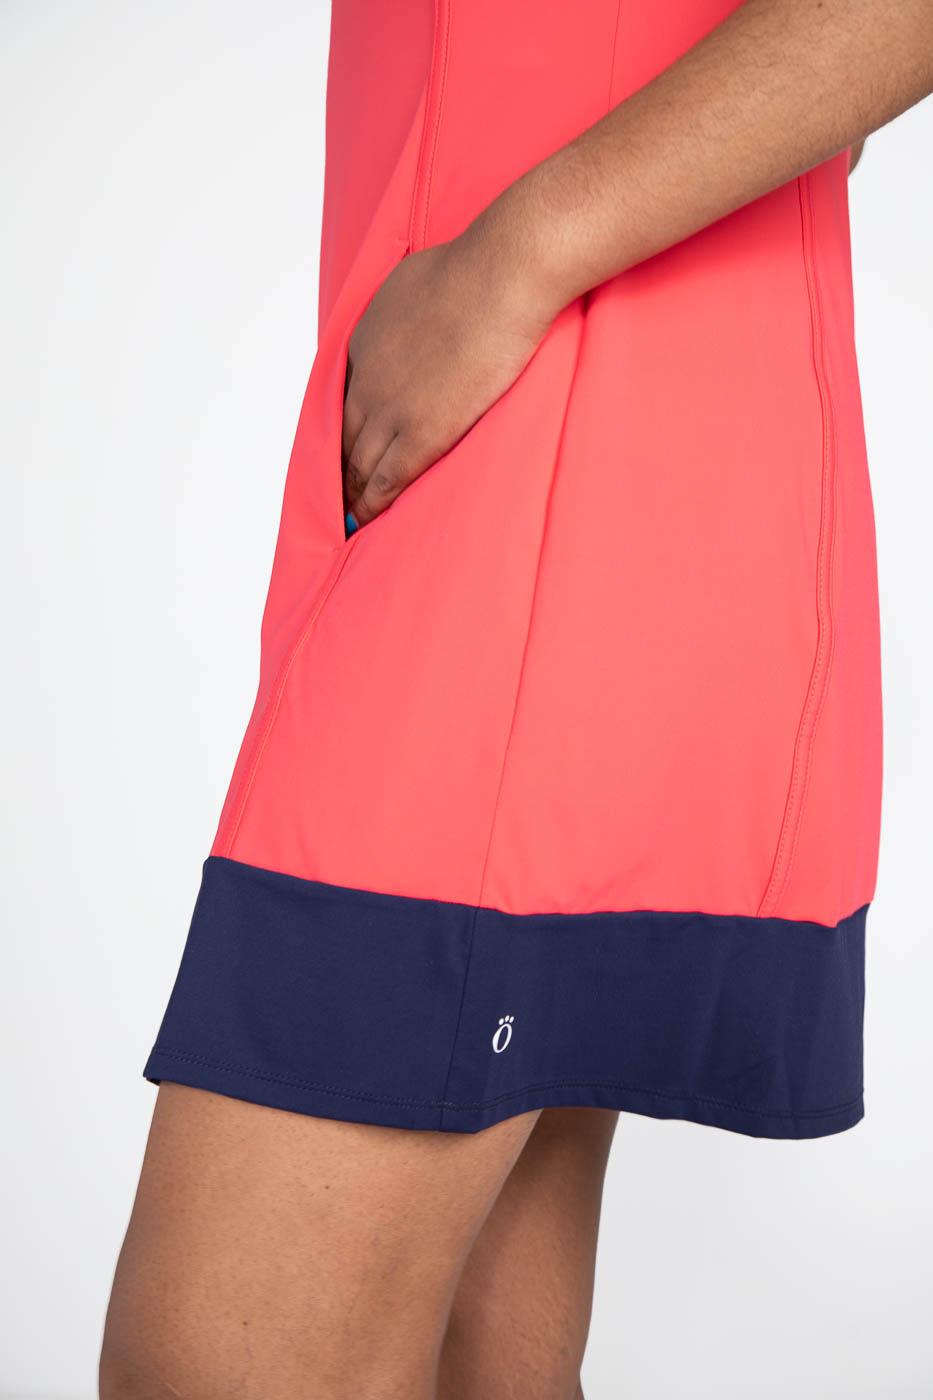 Kick Pleat Chic Sleeveless Golf Dress -Watermelon Red